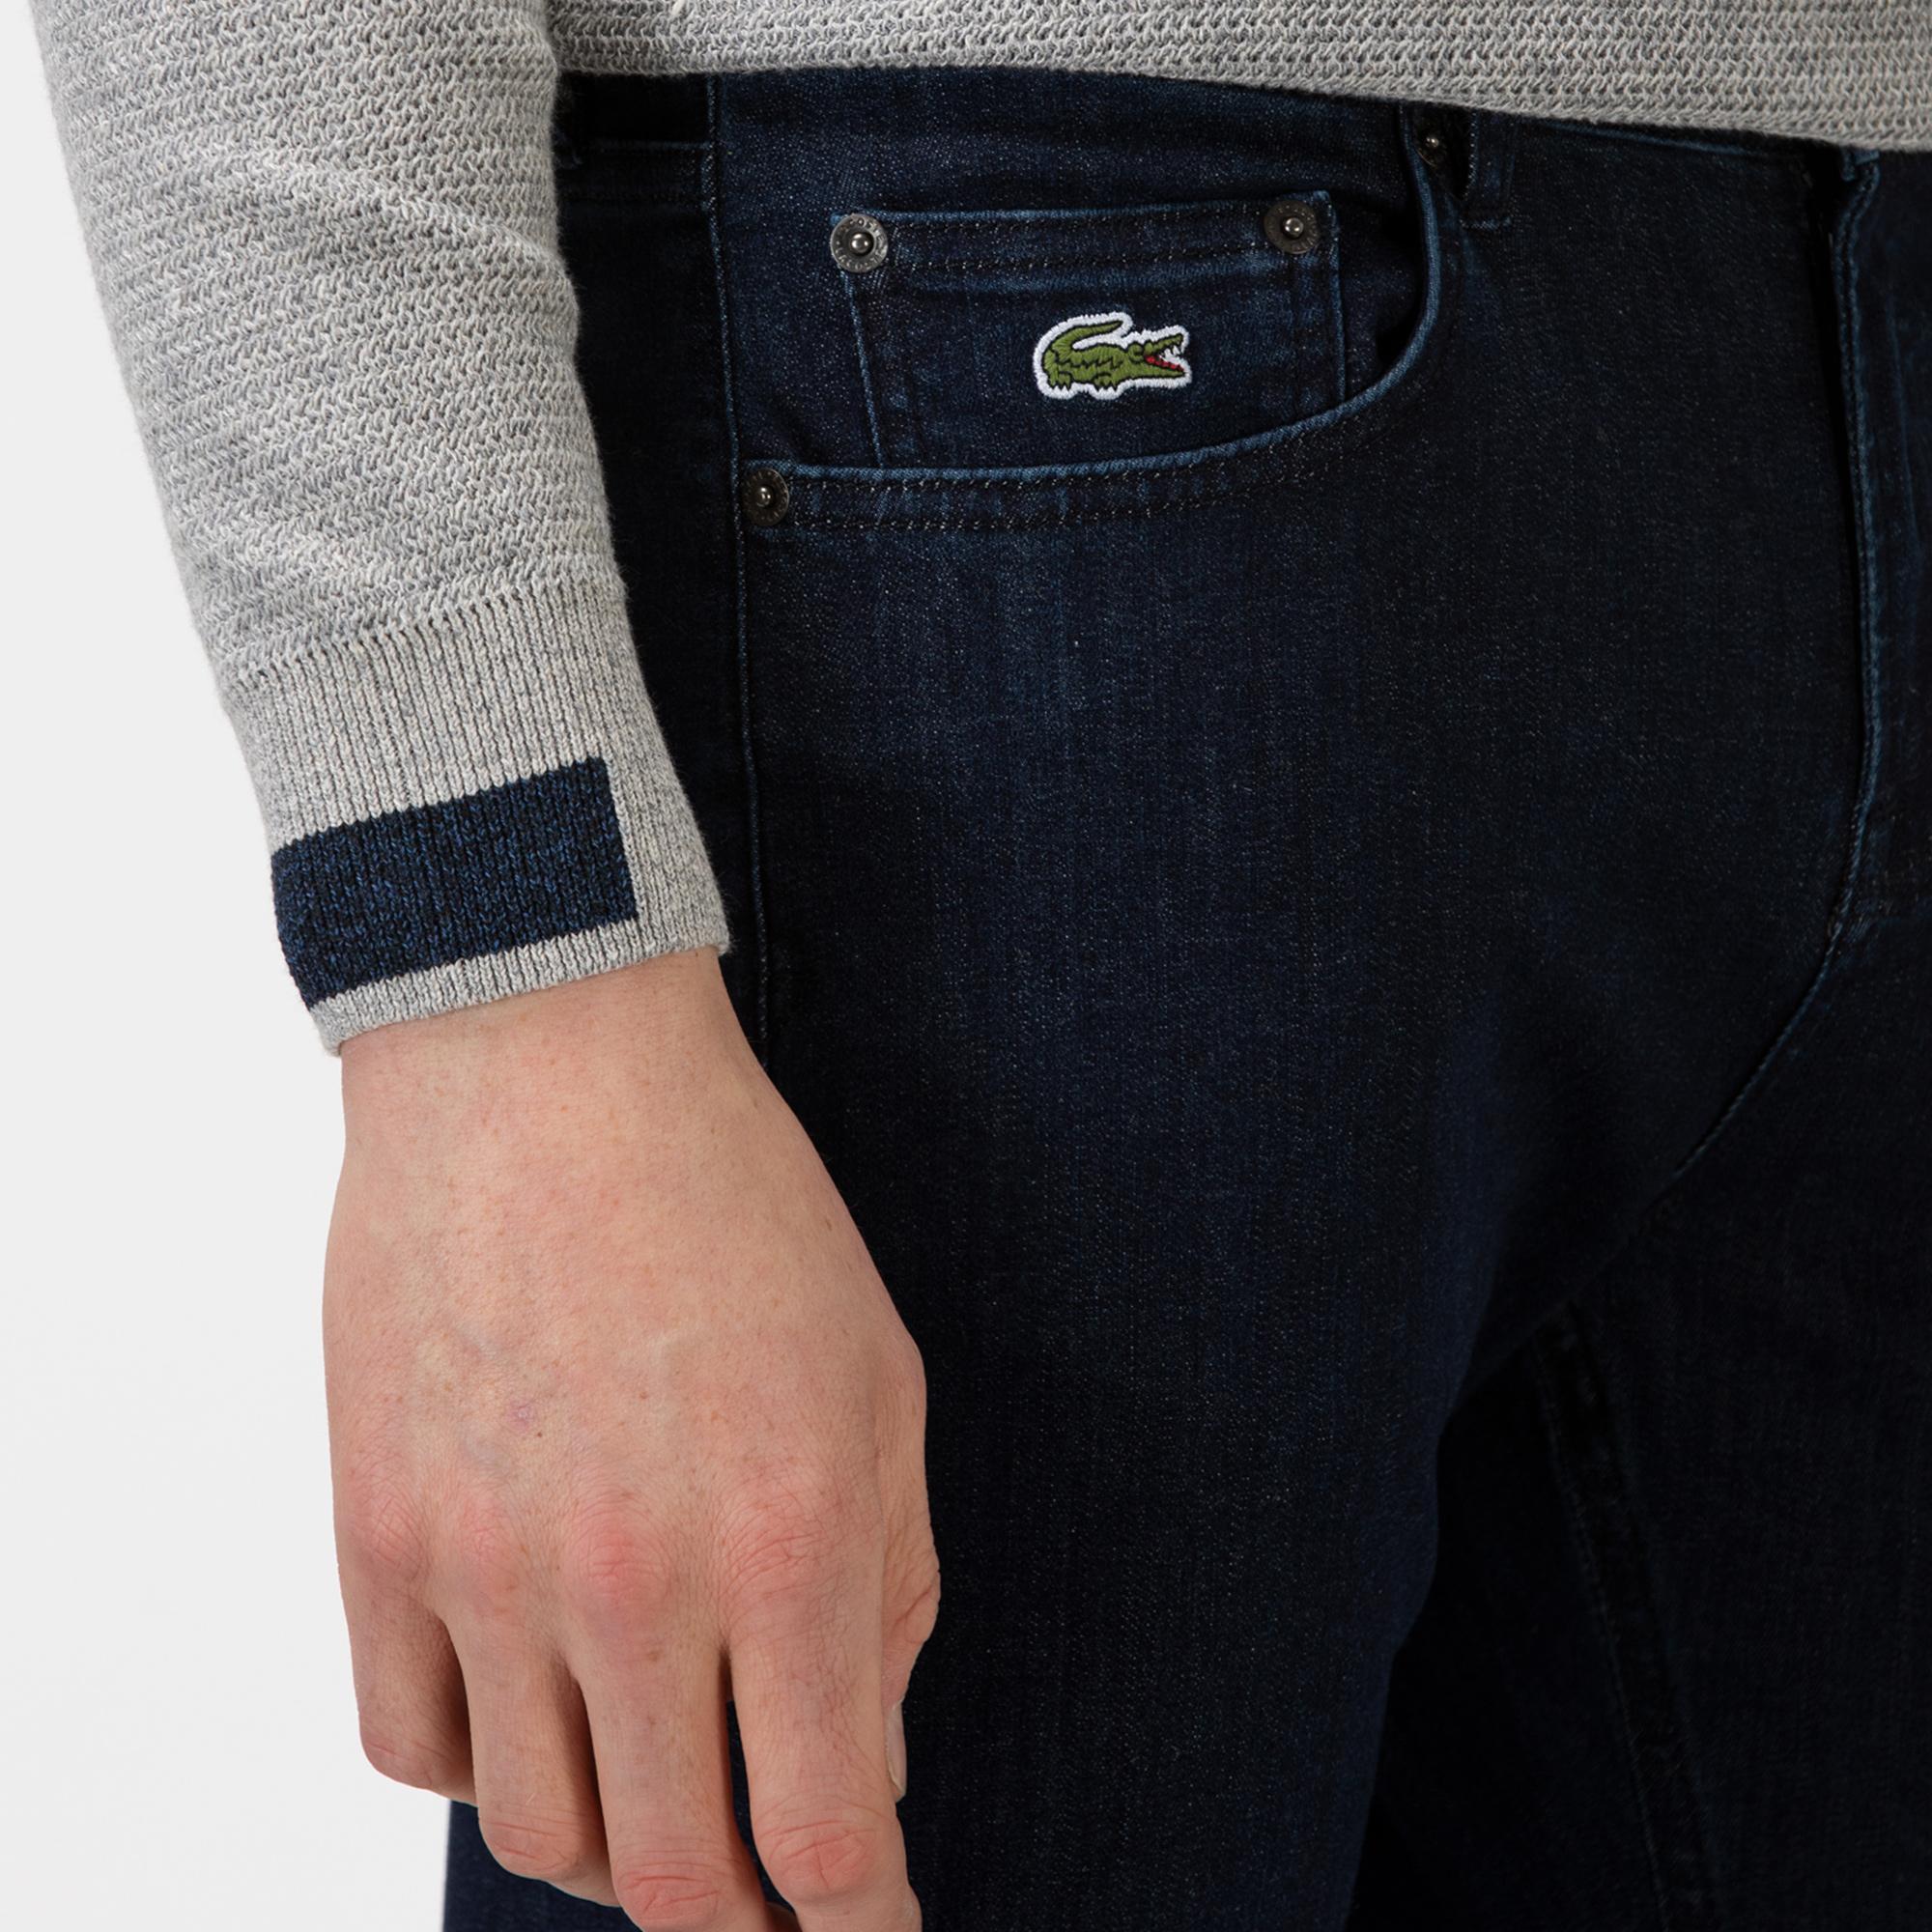 Lacoste Erkek Lacivert Denim Pantolon